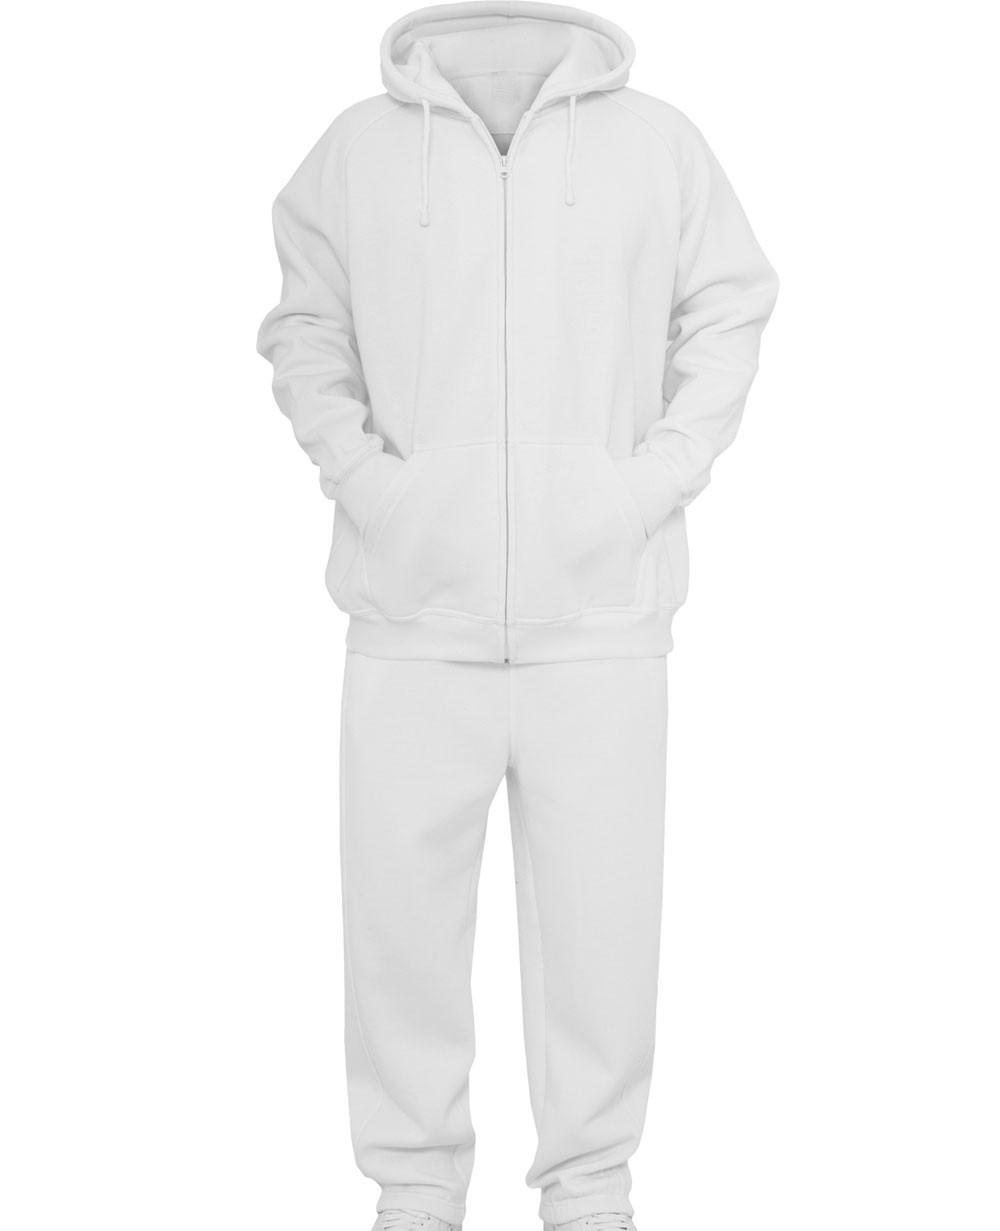 Urban Zipper Classics Blank Suit Men Sweat Suit White